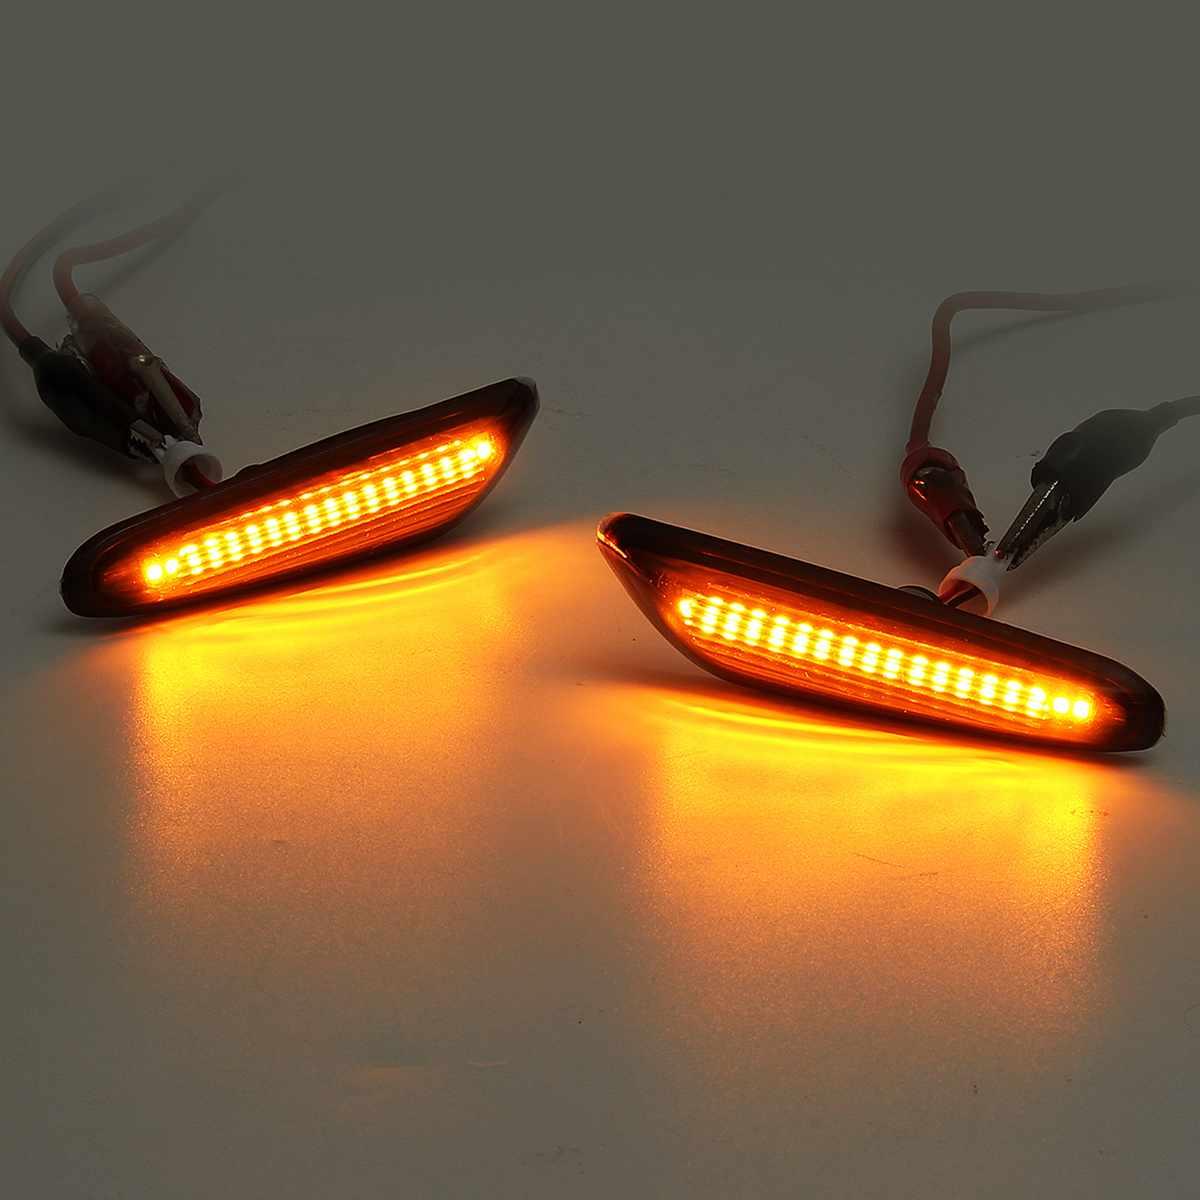 LED Side Marker Light for BMW,1Pair Amber LED Turn Signal Light Lamp Cover Replacement For BMW E82 E88 E46 E60 E61 E90 E91 E92